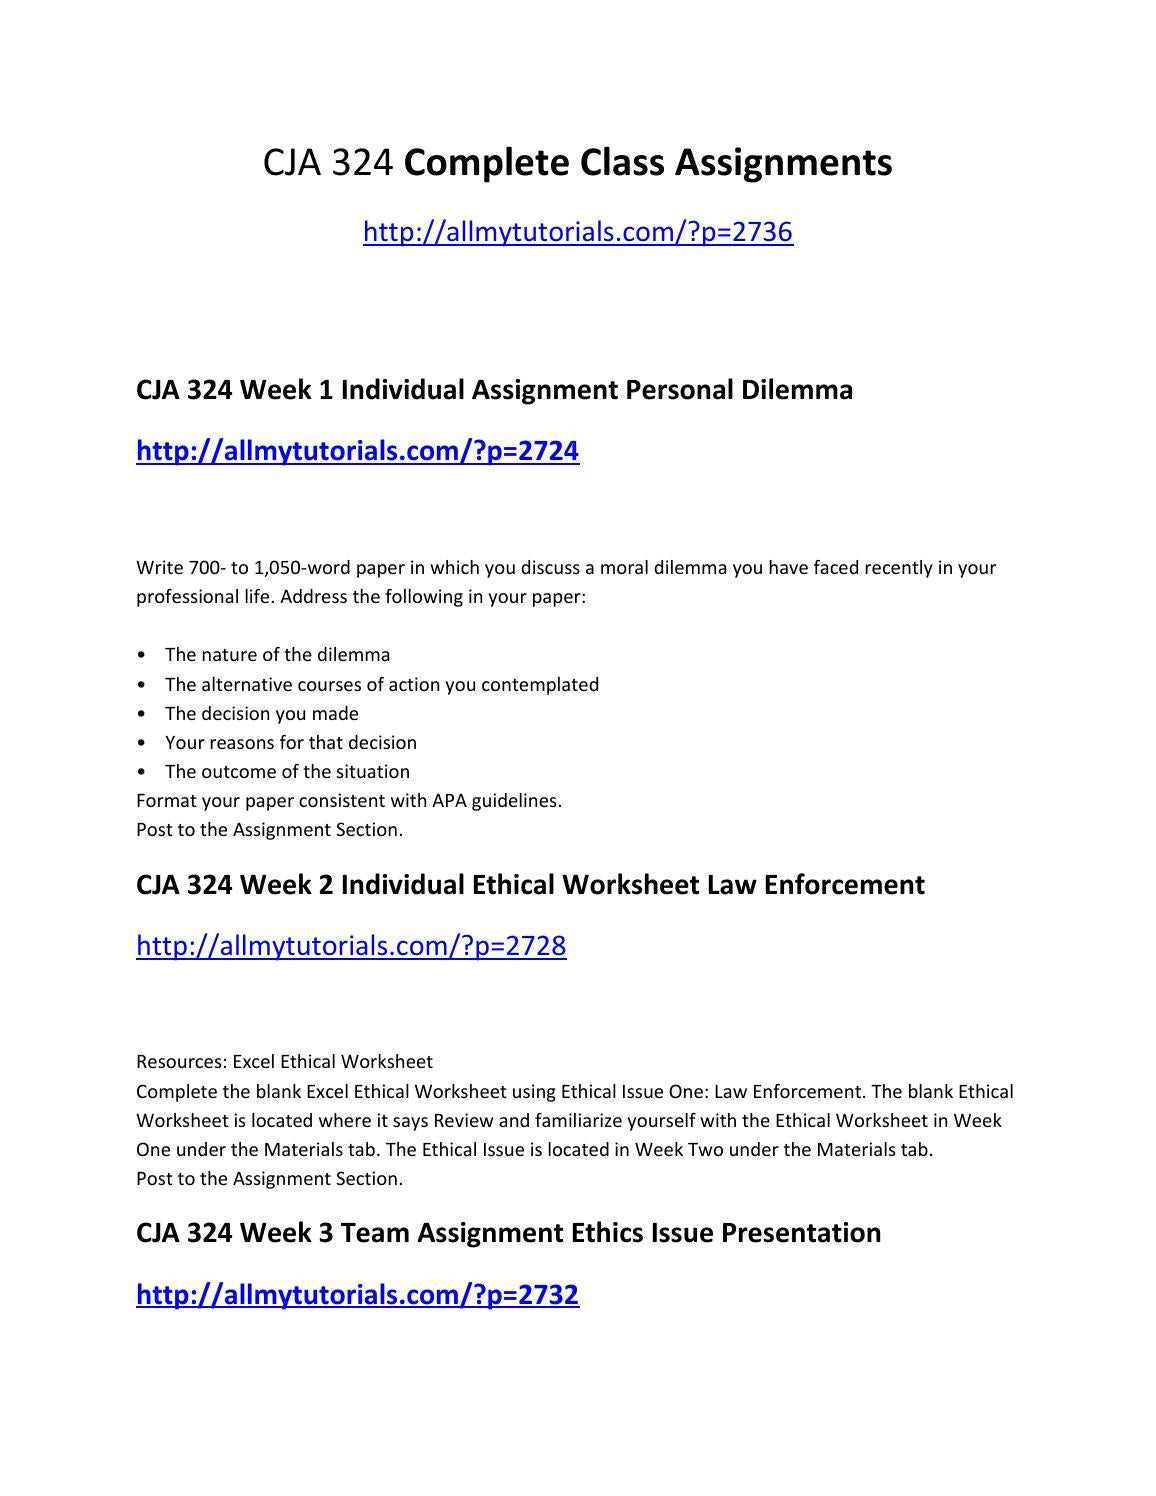 Ethical dilemma worksheet law enforcement scenario